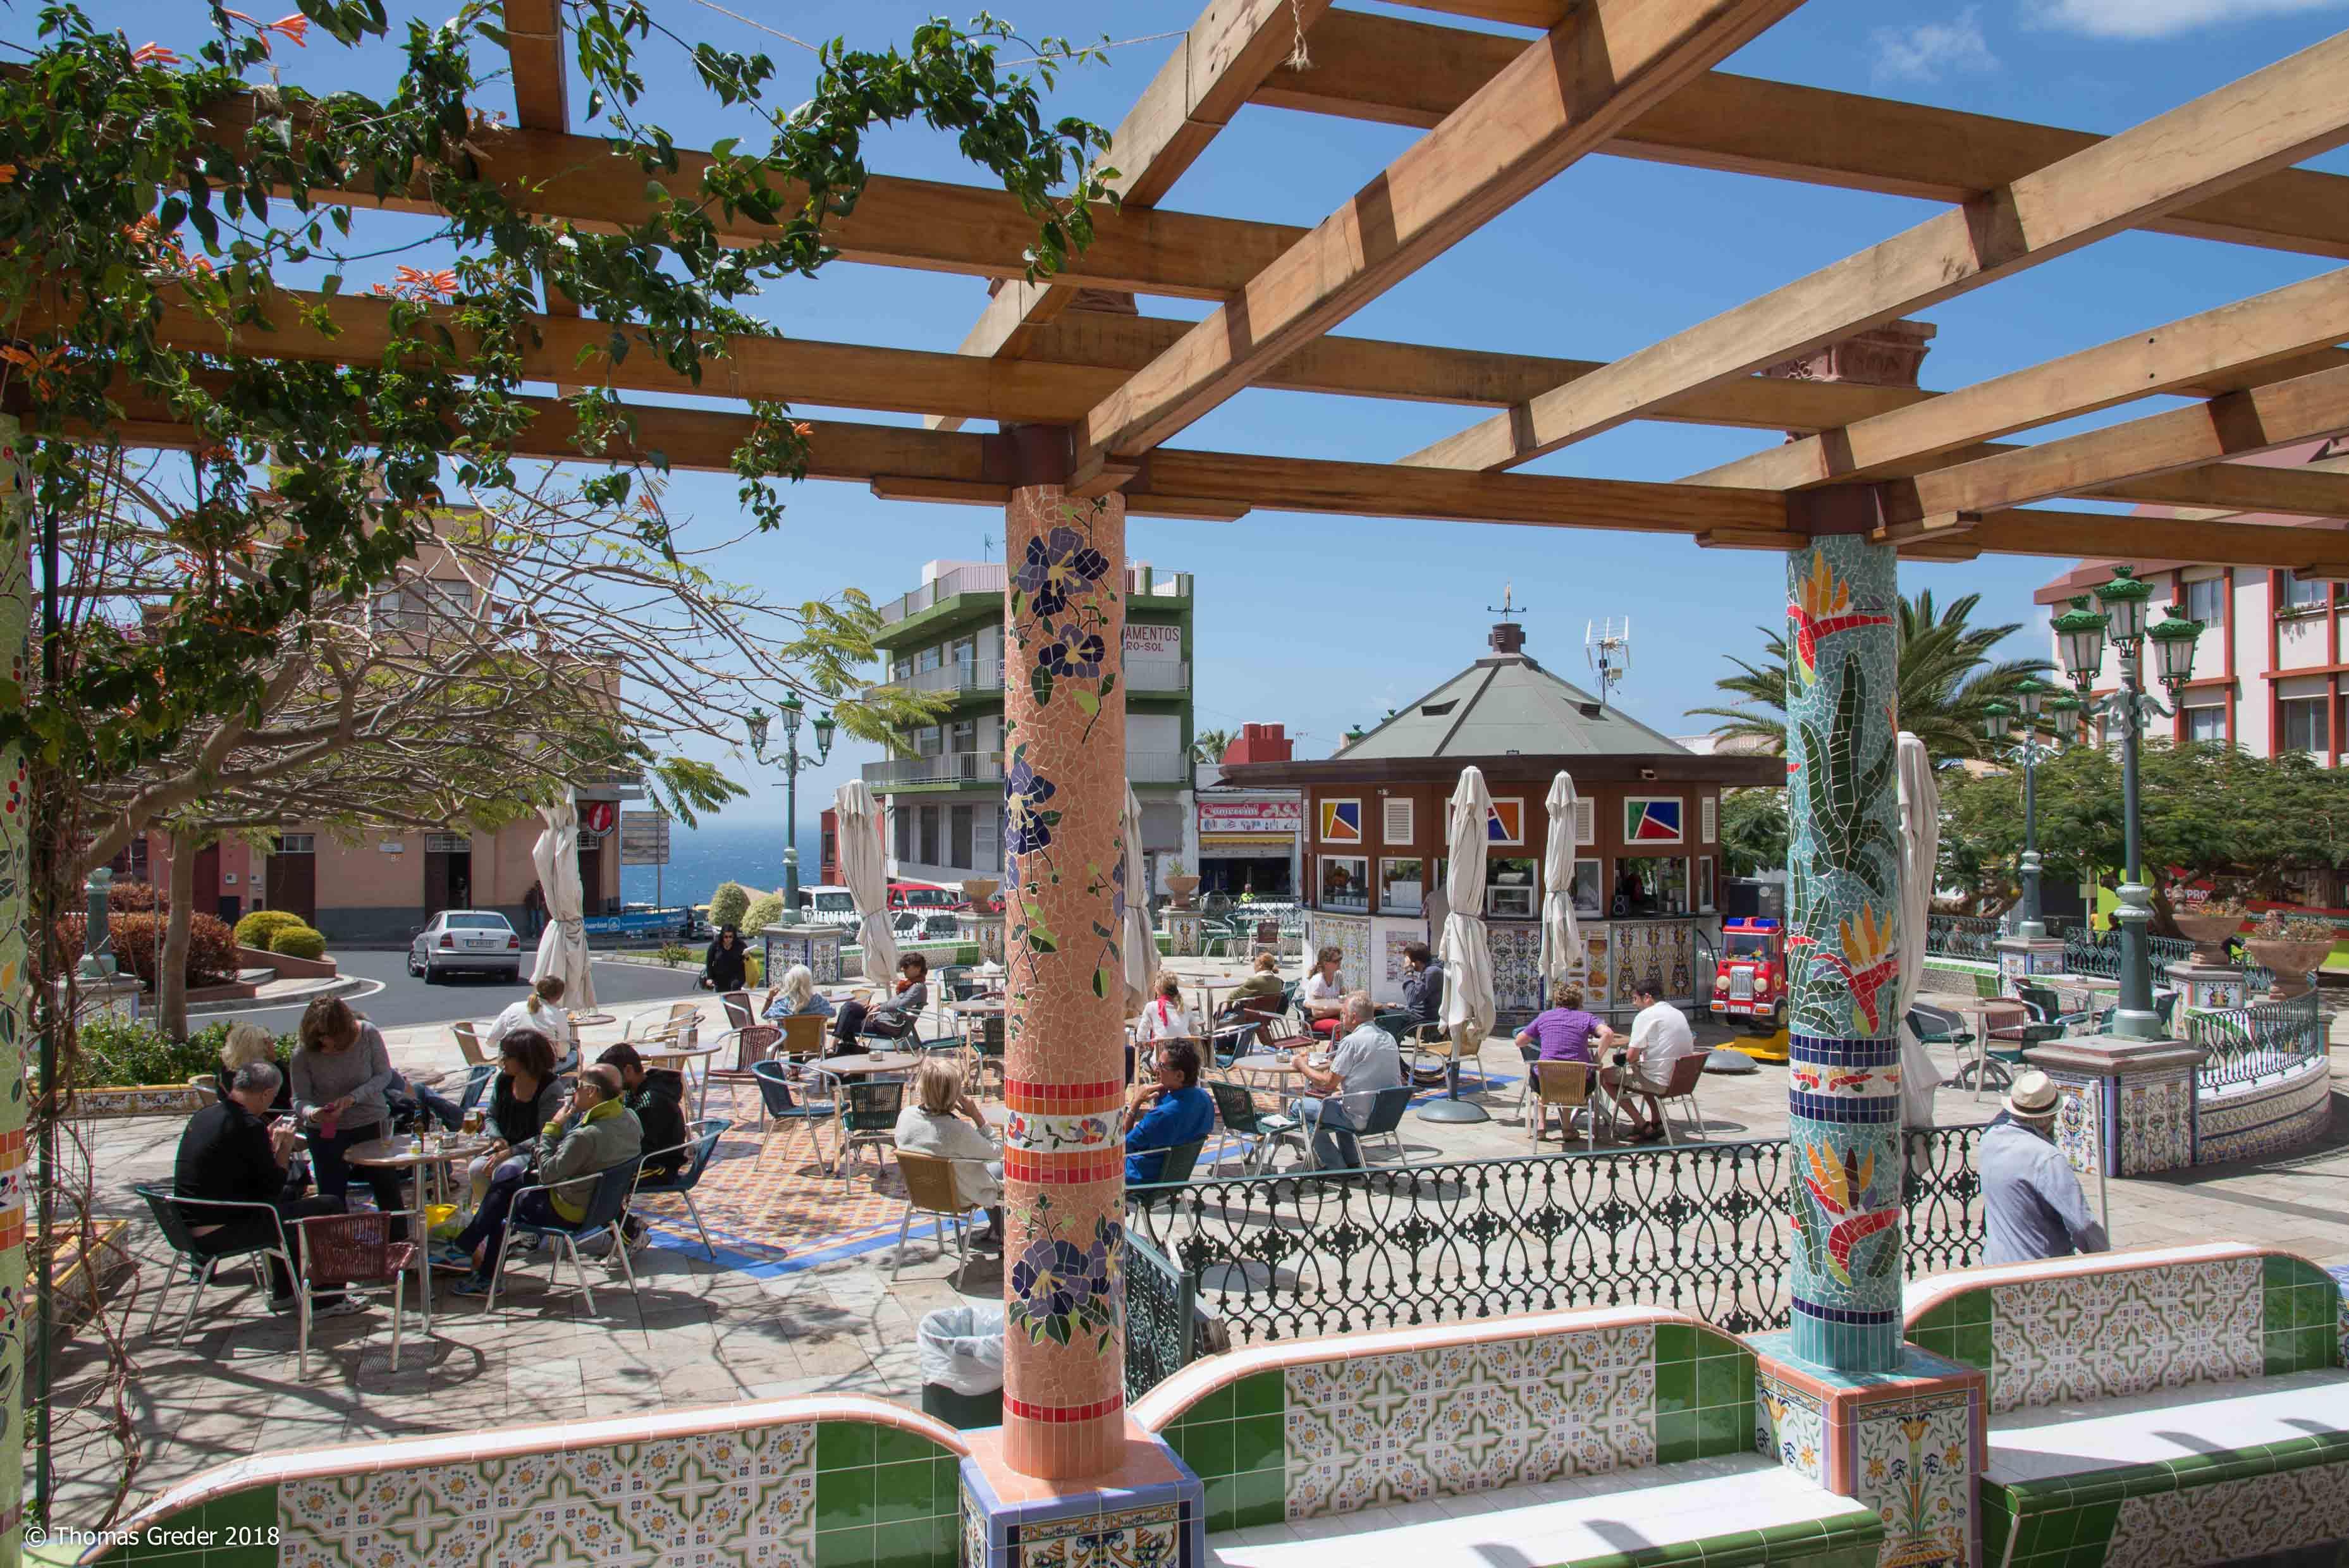 Plaza von Tazacorte